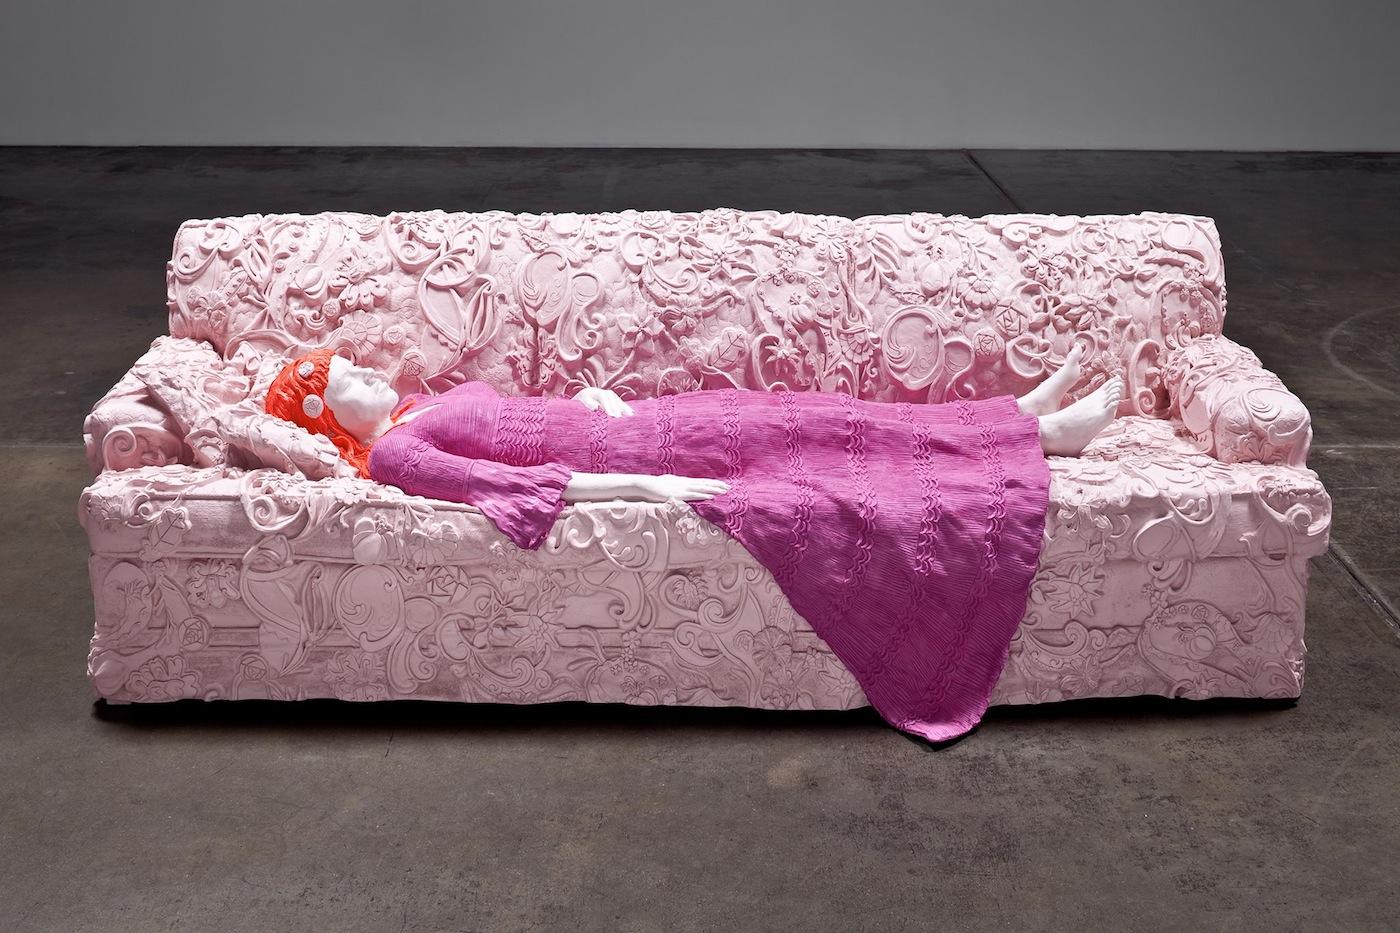 "Liz Craft, ""Nicole Couch (Pink, Fuchsia, Orange)"" (2010), Fiberglass and paint, 32 x 98 x 40.5 inches. (via facebook)"